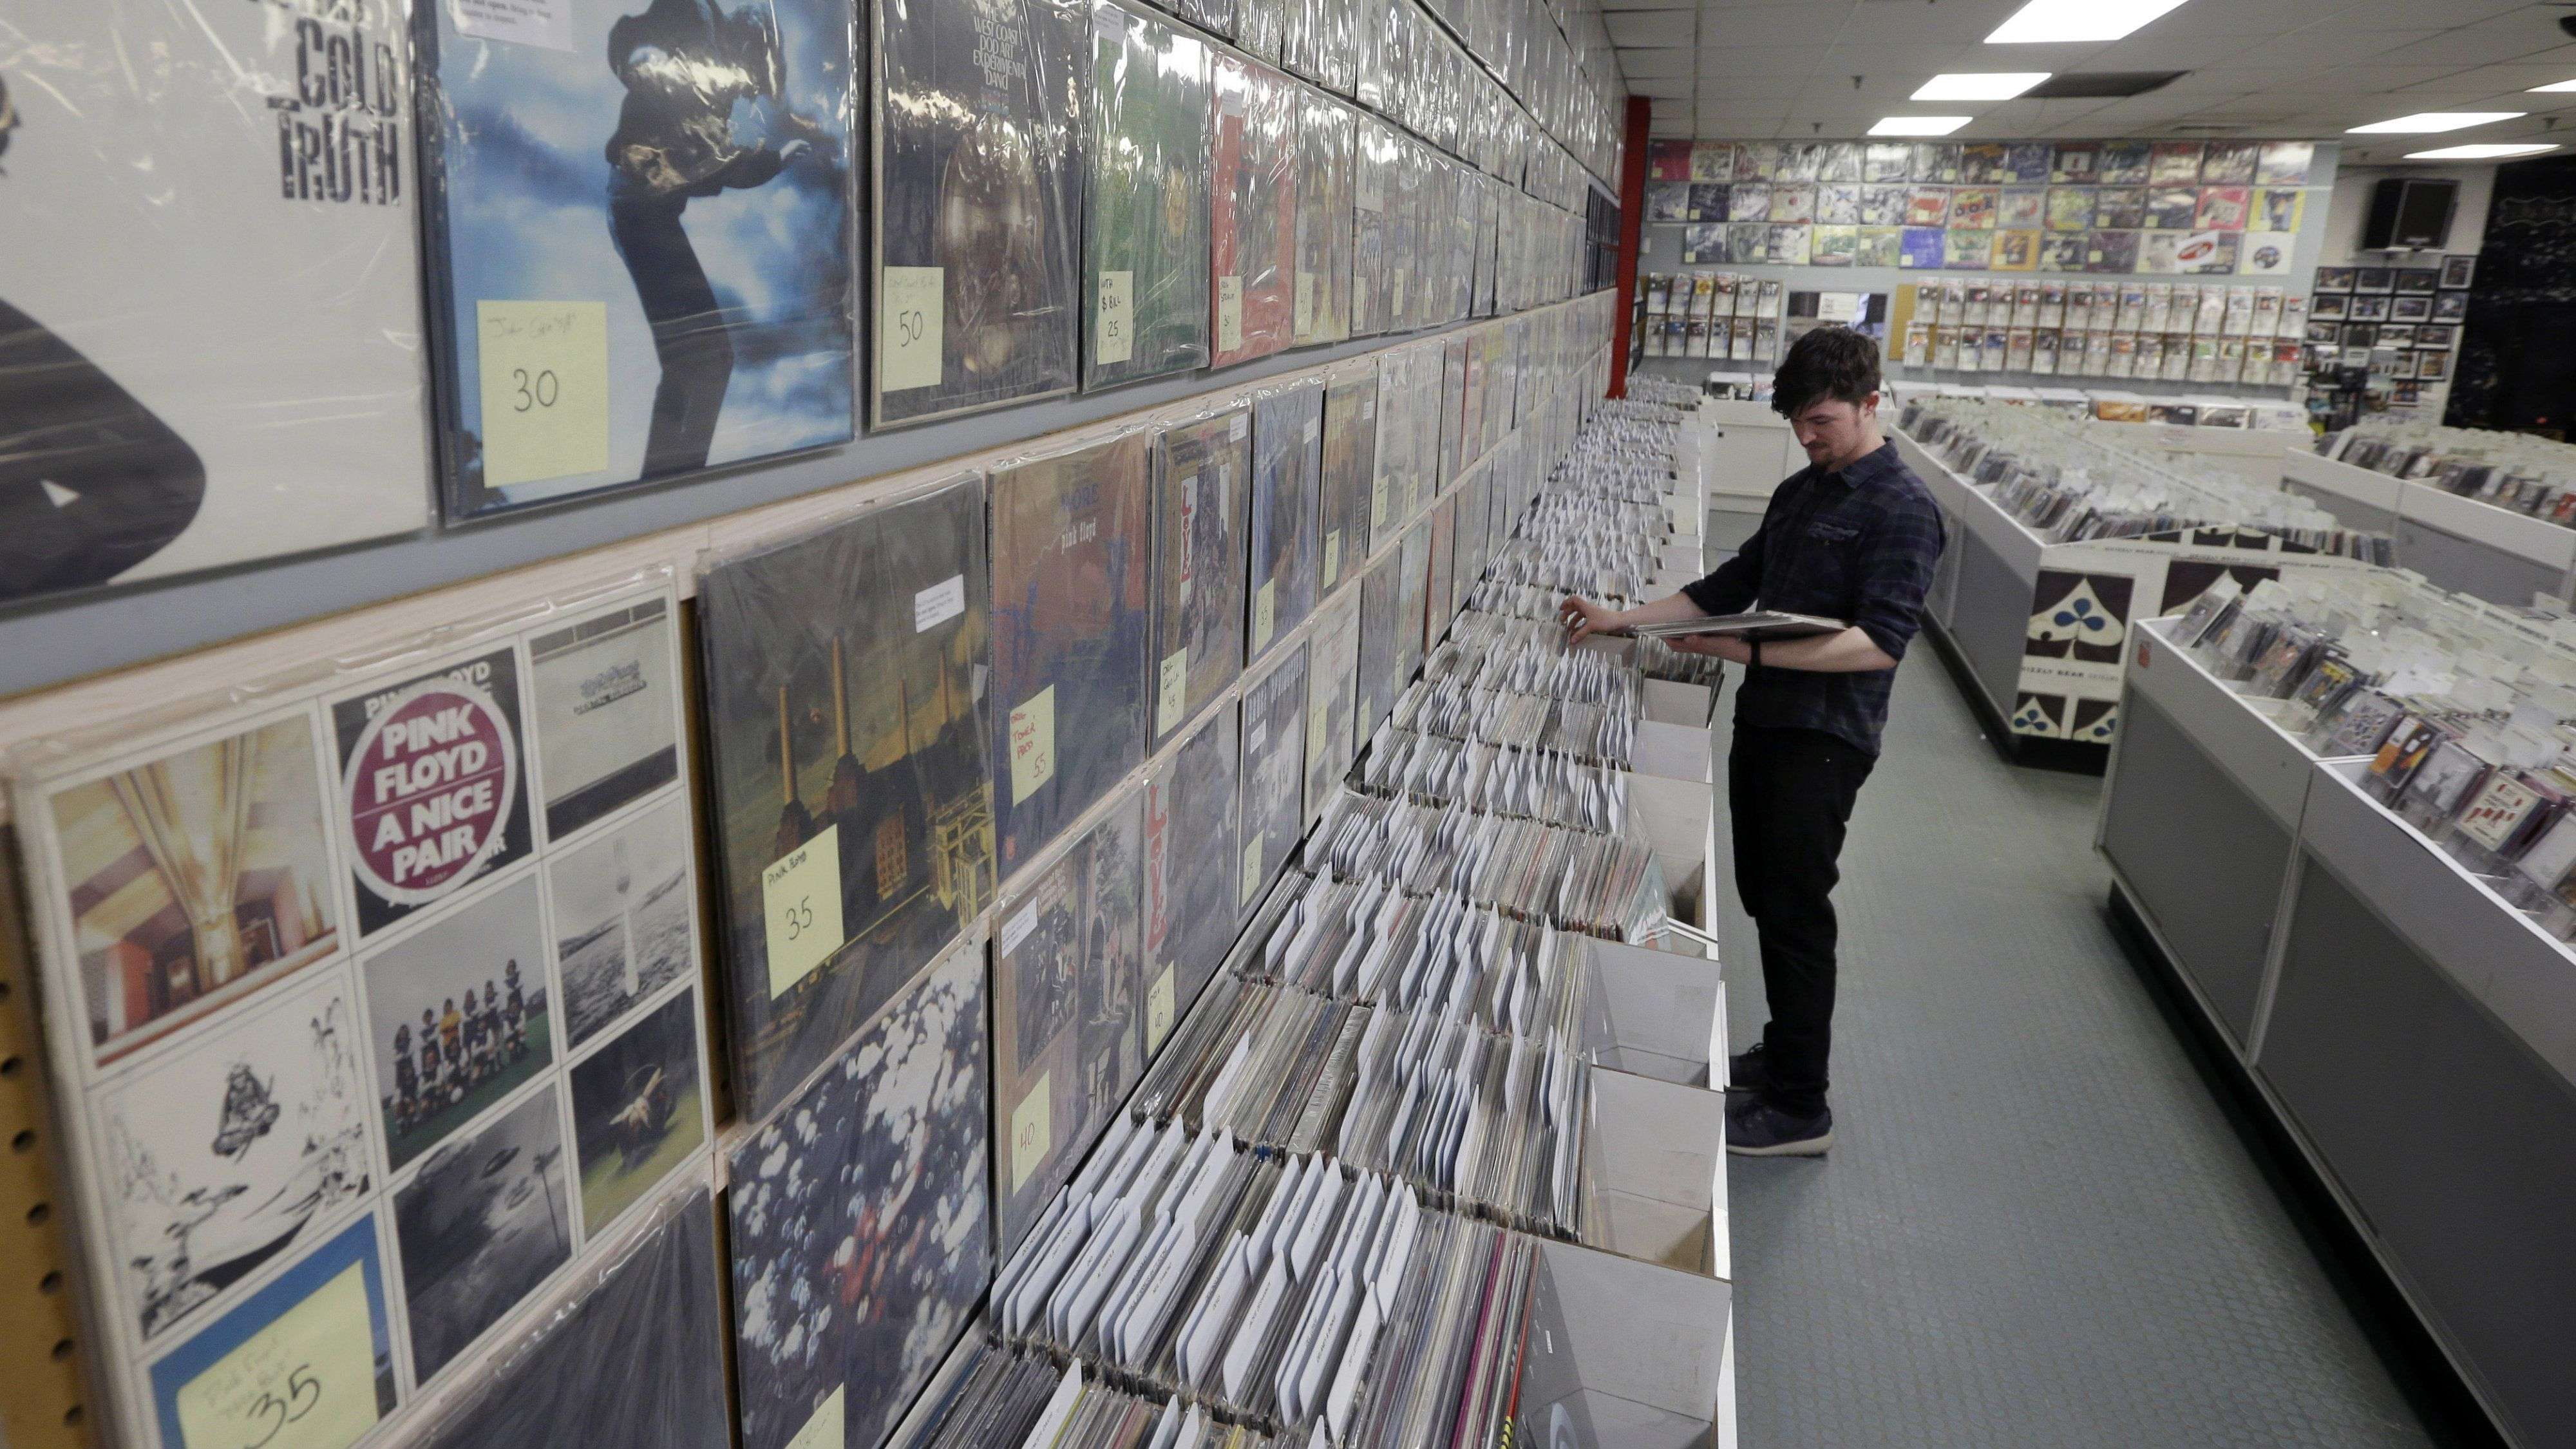 Record clerk Josh Kelly puts LP records in sales bins at Vintage Vinyl Records Tuesday, April 14, 2015